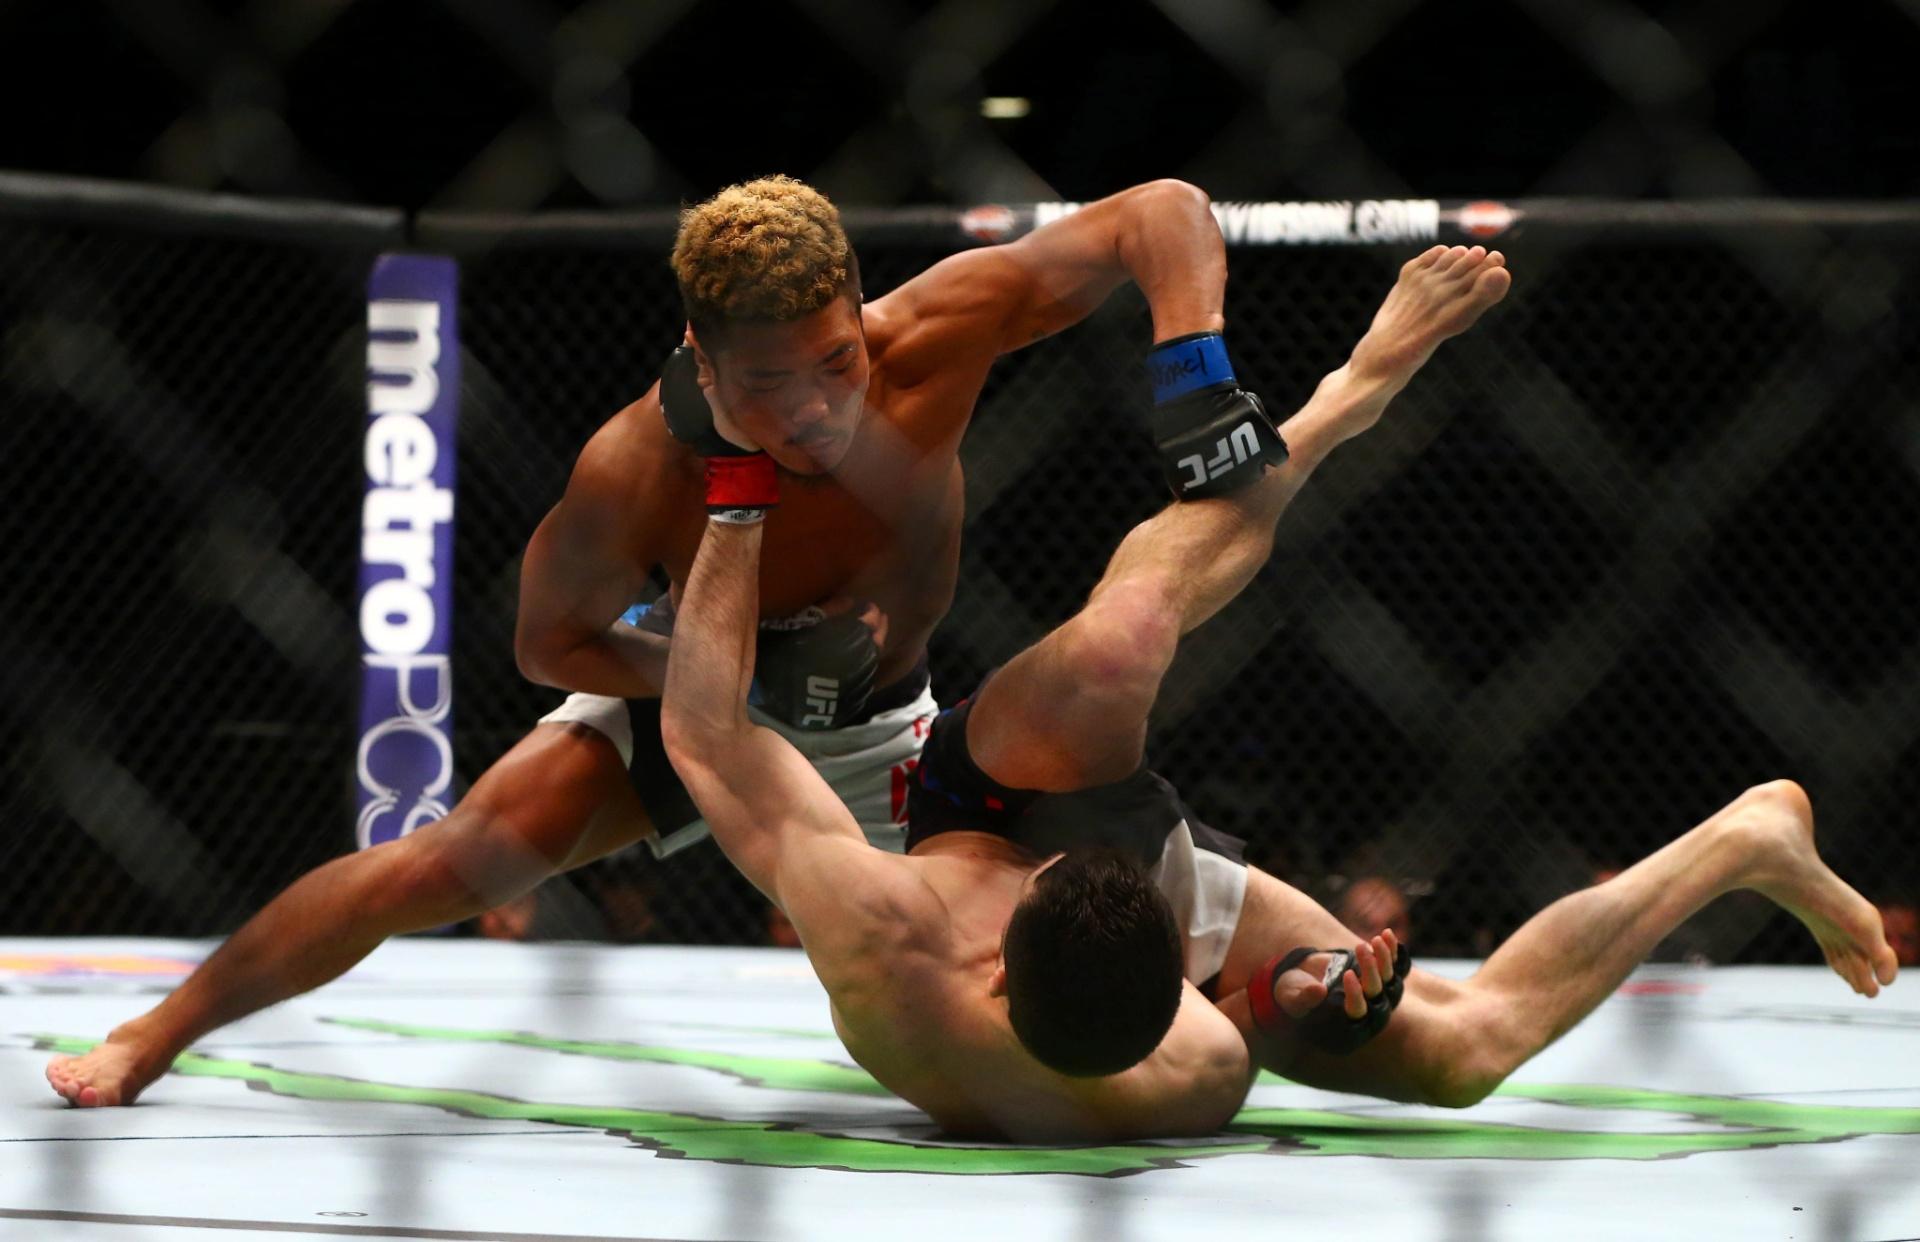 Teroto Ishihara desfere socos em Julian Erosa durante o card preliminar do UFC 196